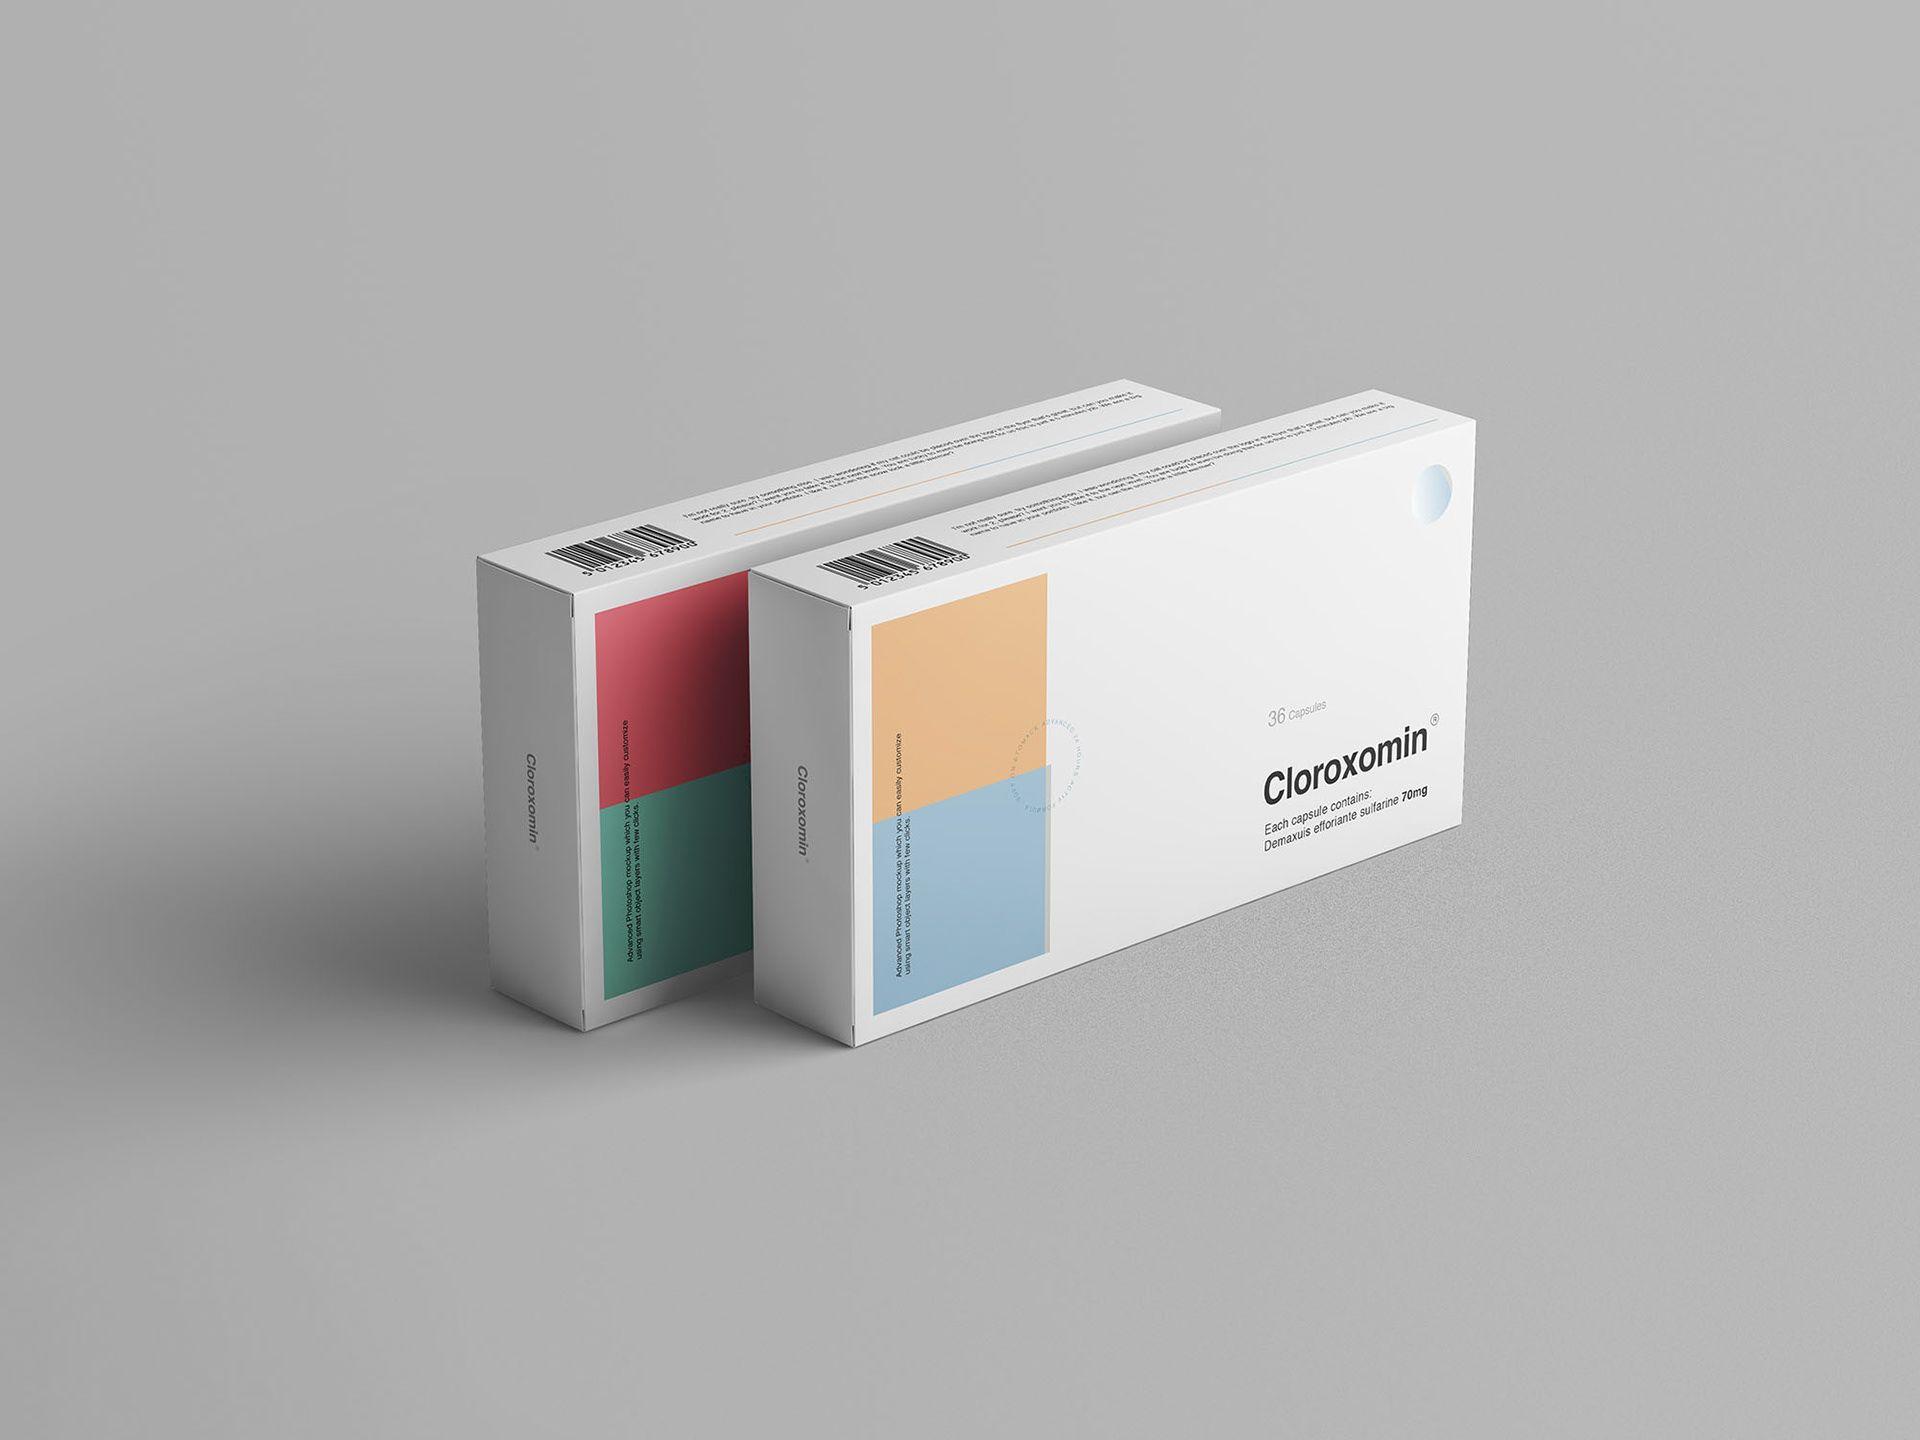 Download Pills Box Packaging Mockup On Behance Packaging Mockup Medicine Box Design Medical Packaging